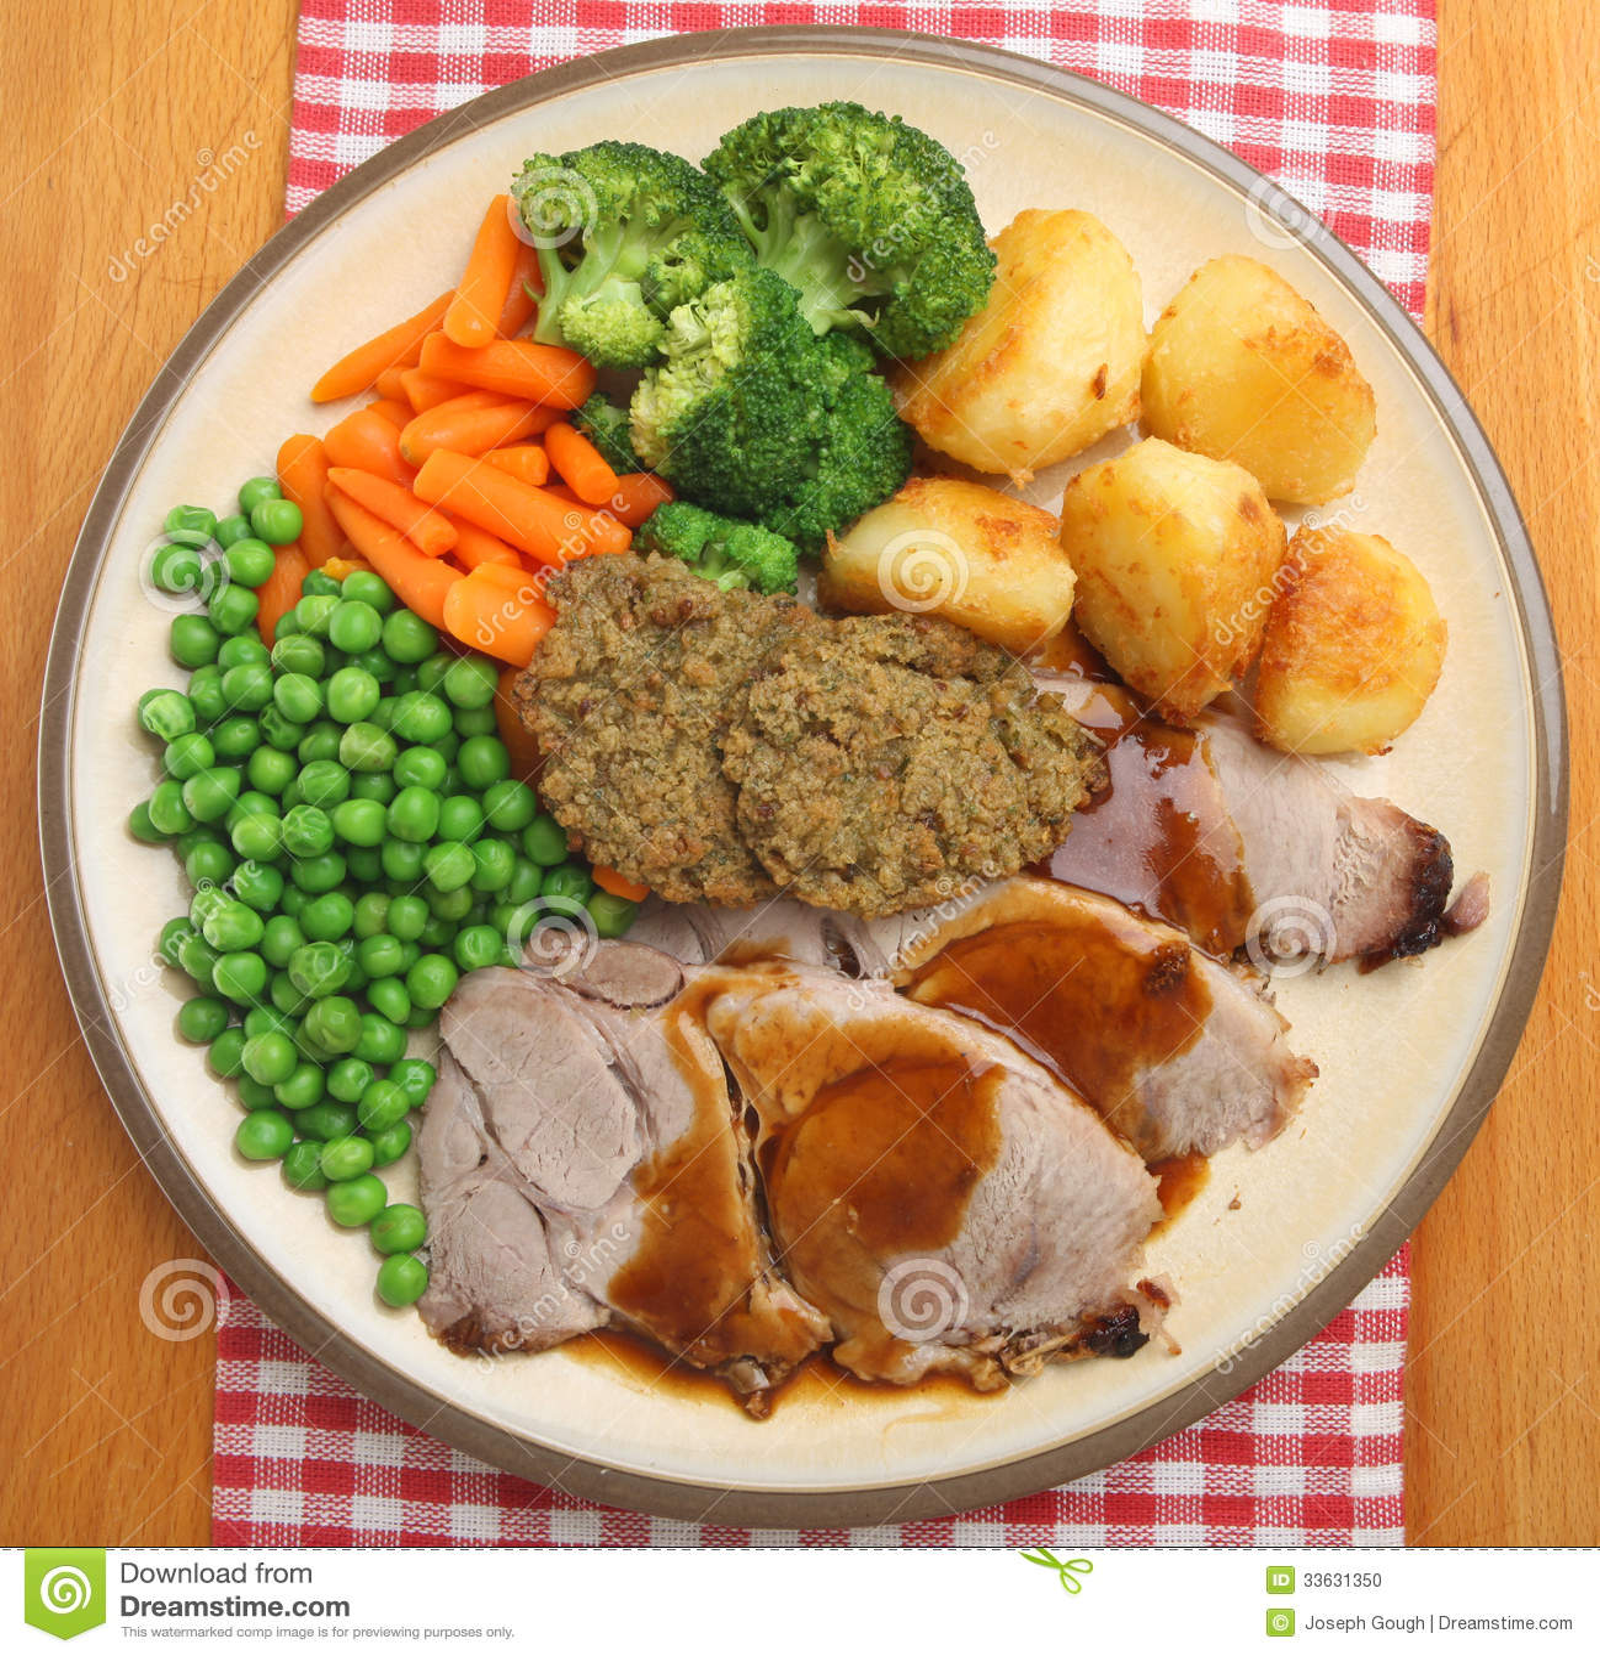 Sunday Roast Pork Dinner From Above Stock Photo - Image: 33631350